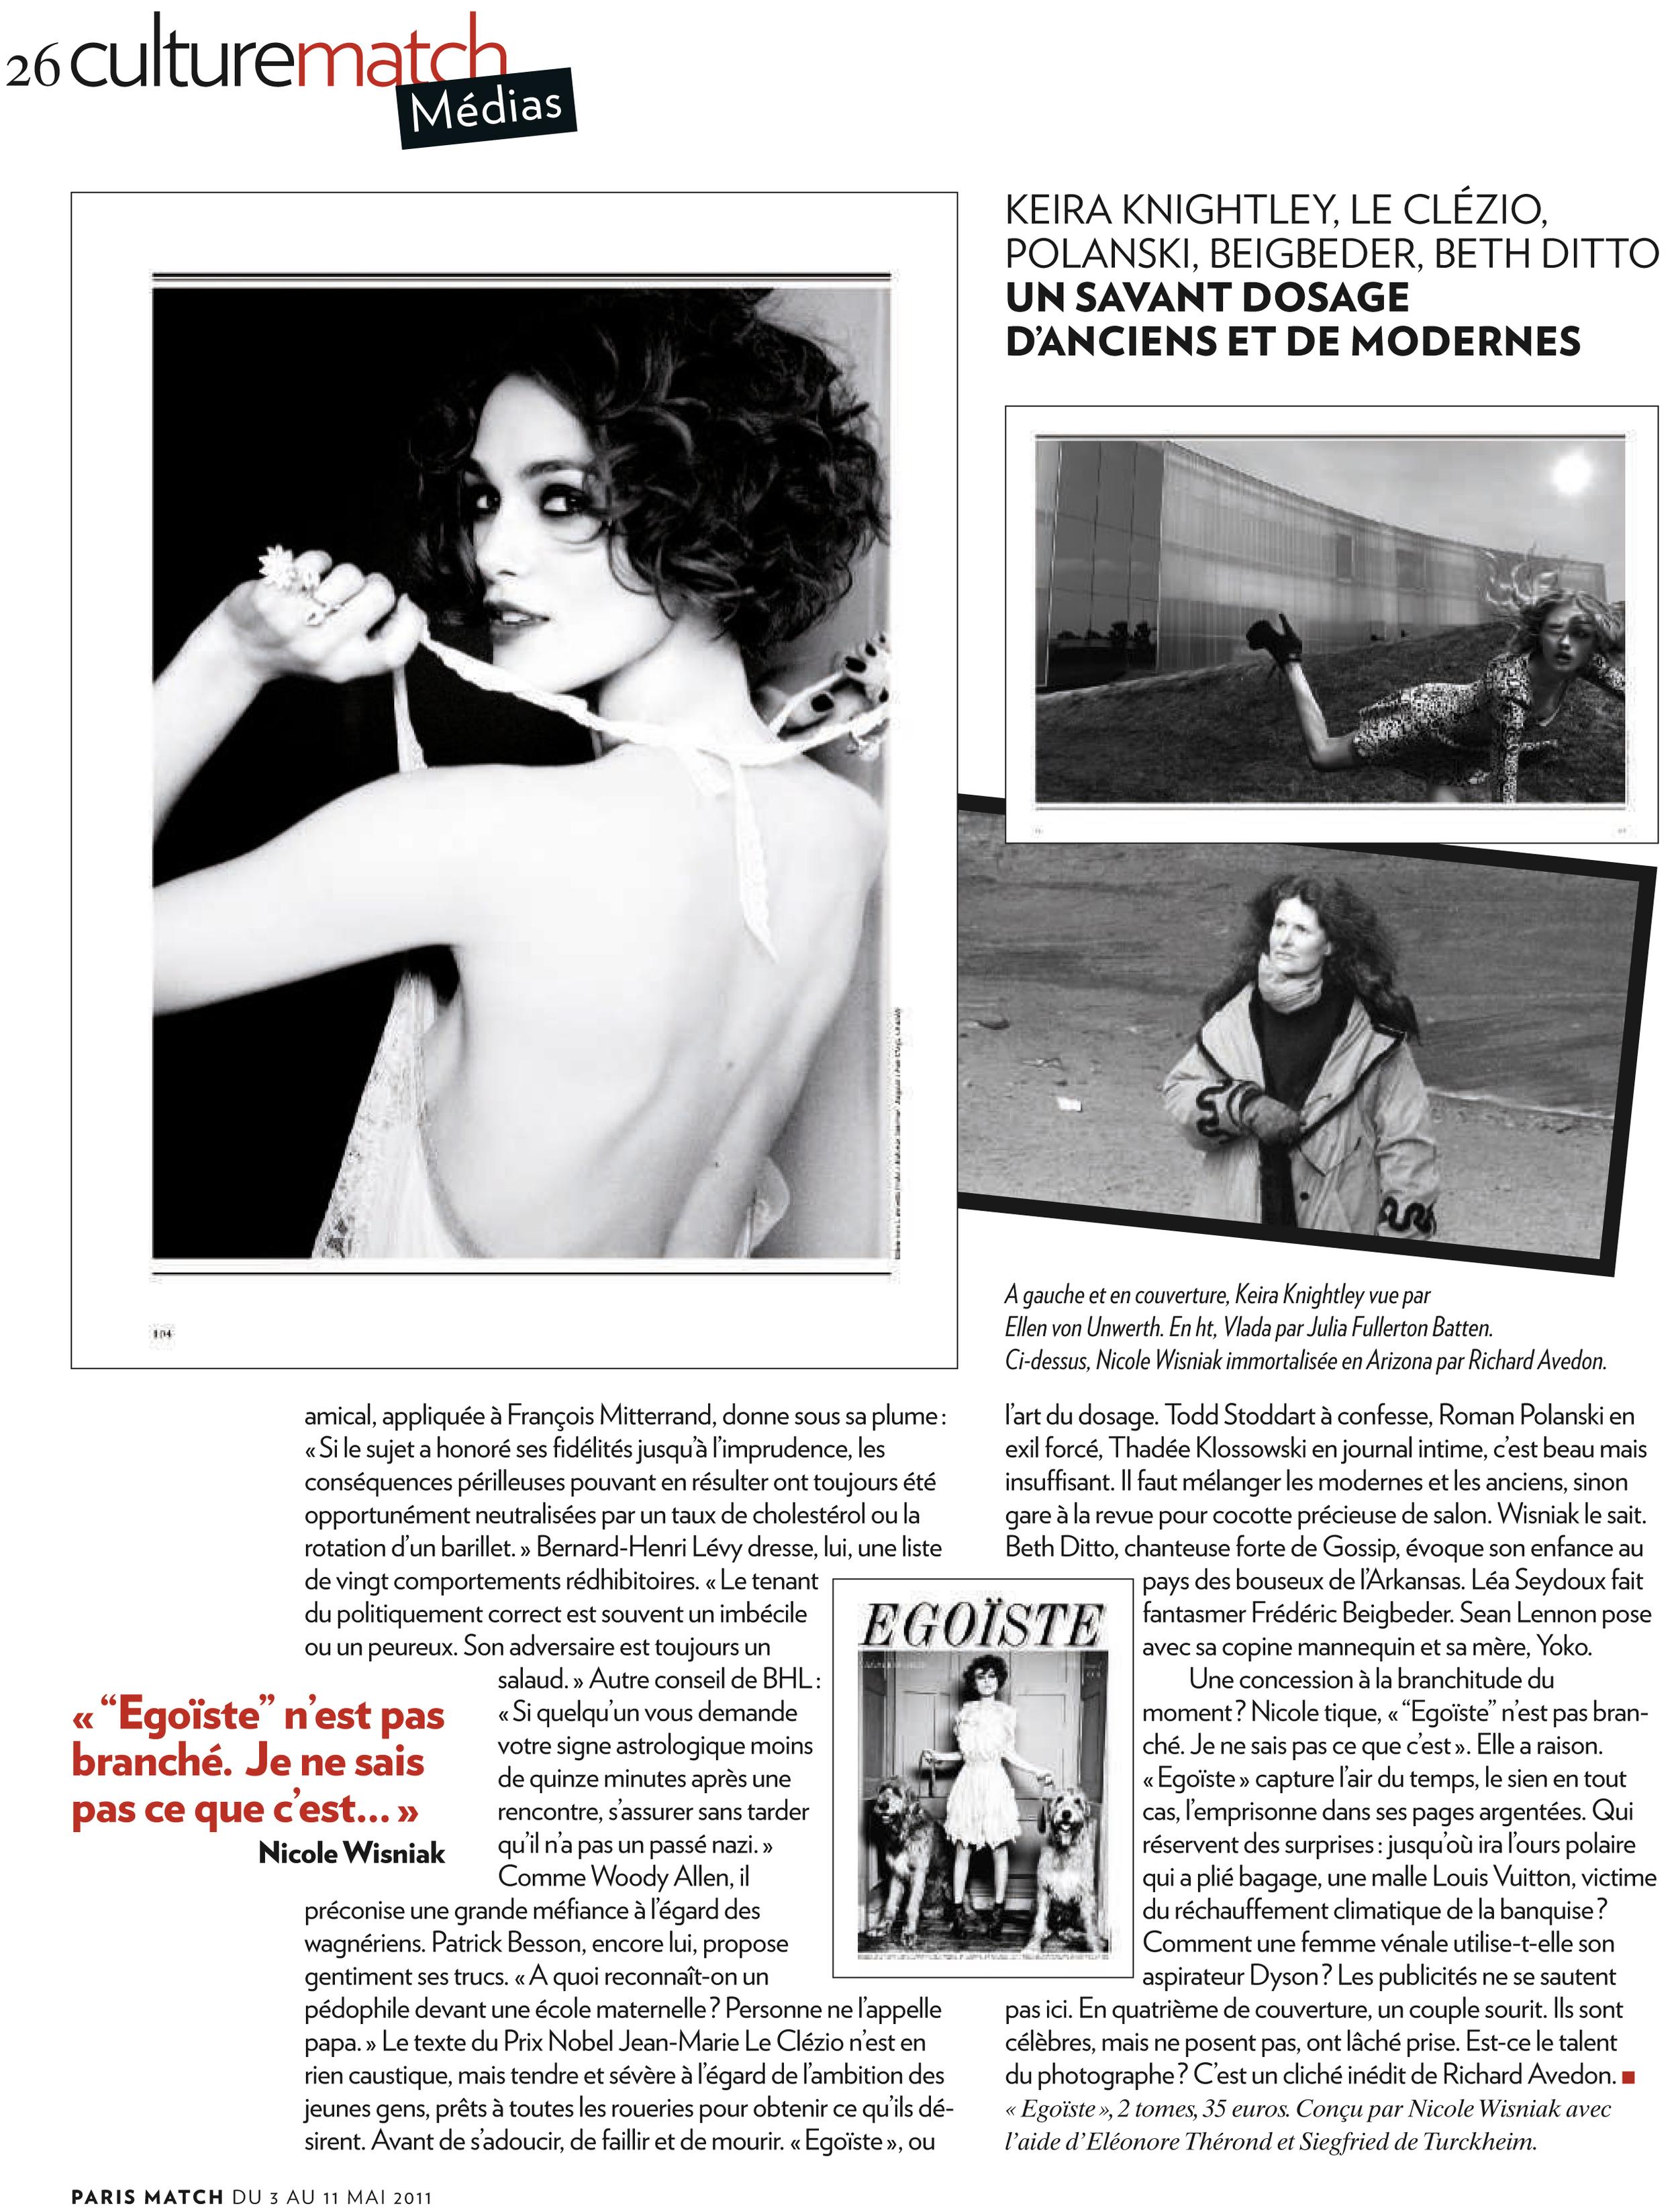 Paris Match 2.jpg